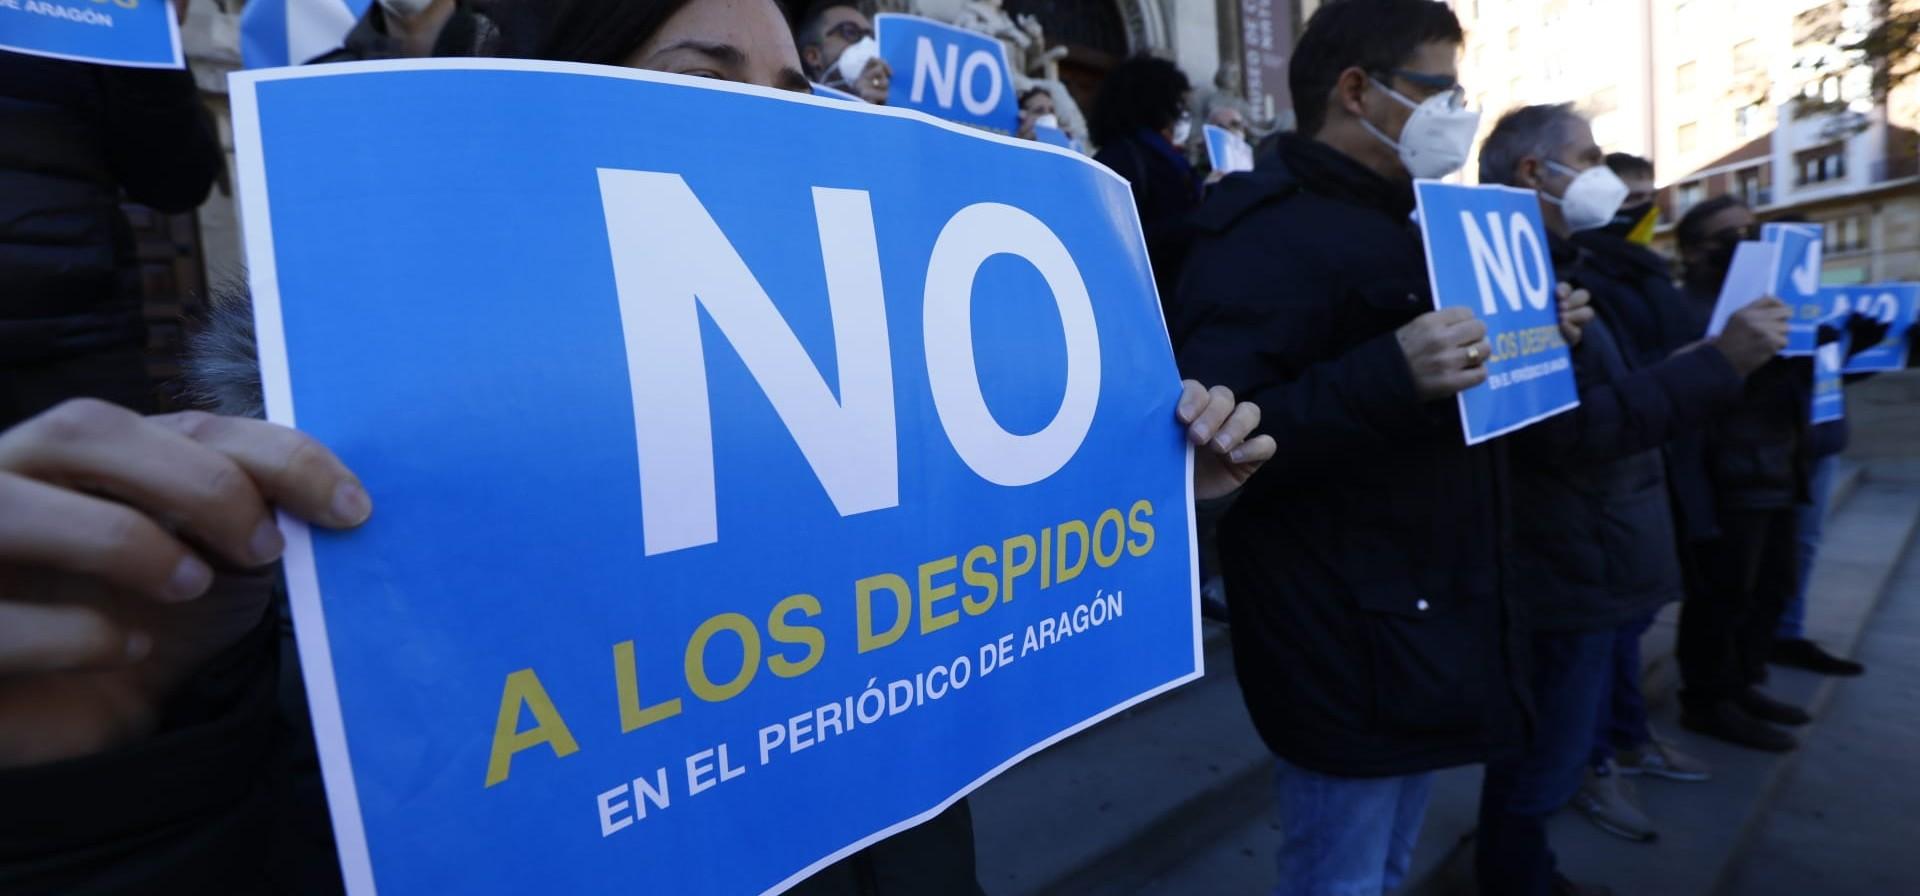 prensa-iberica-despidos-periodico-aragon